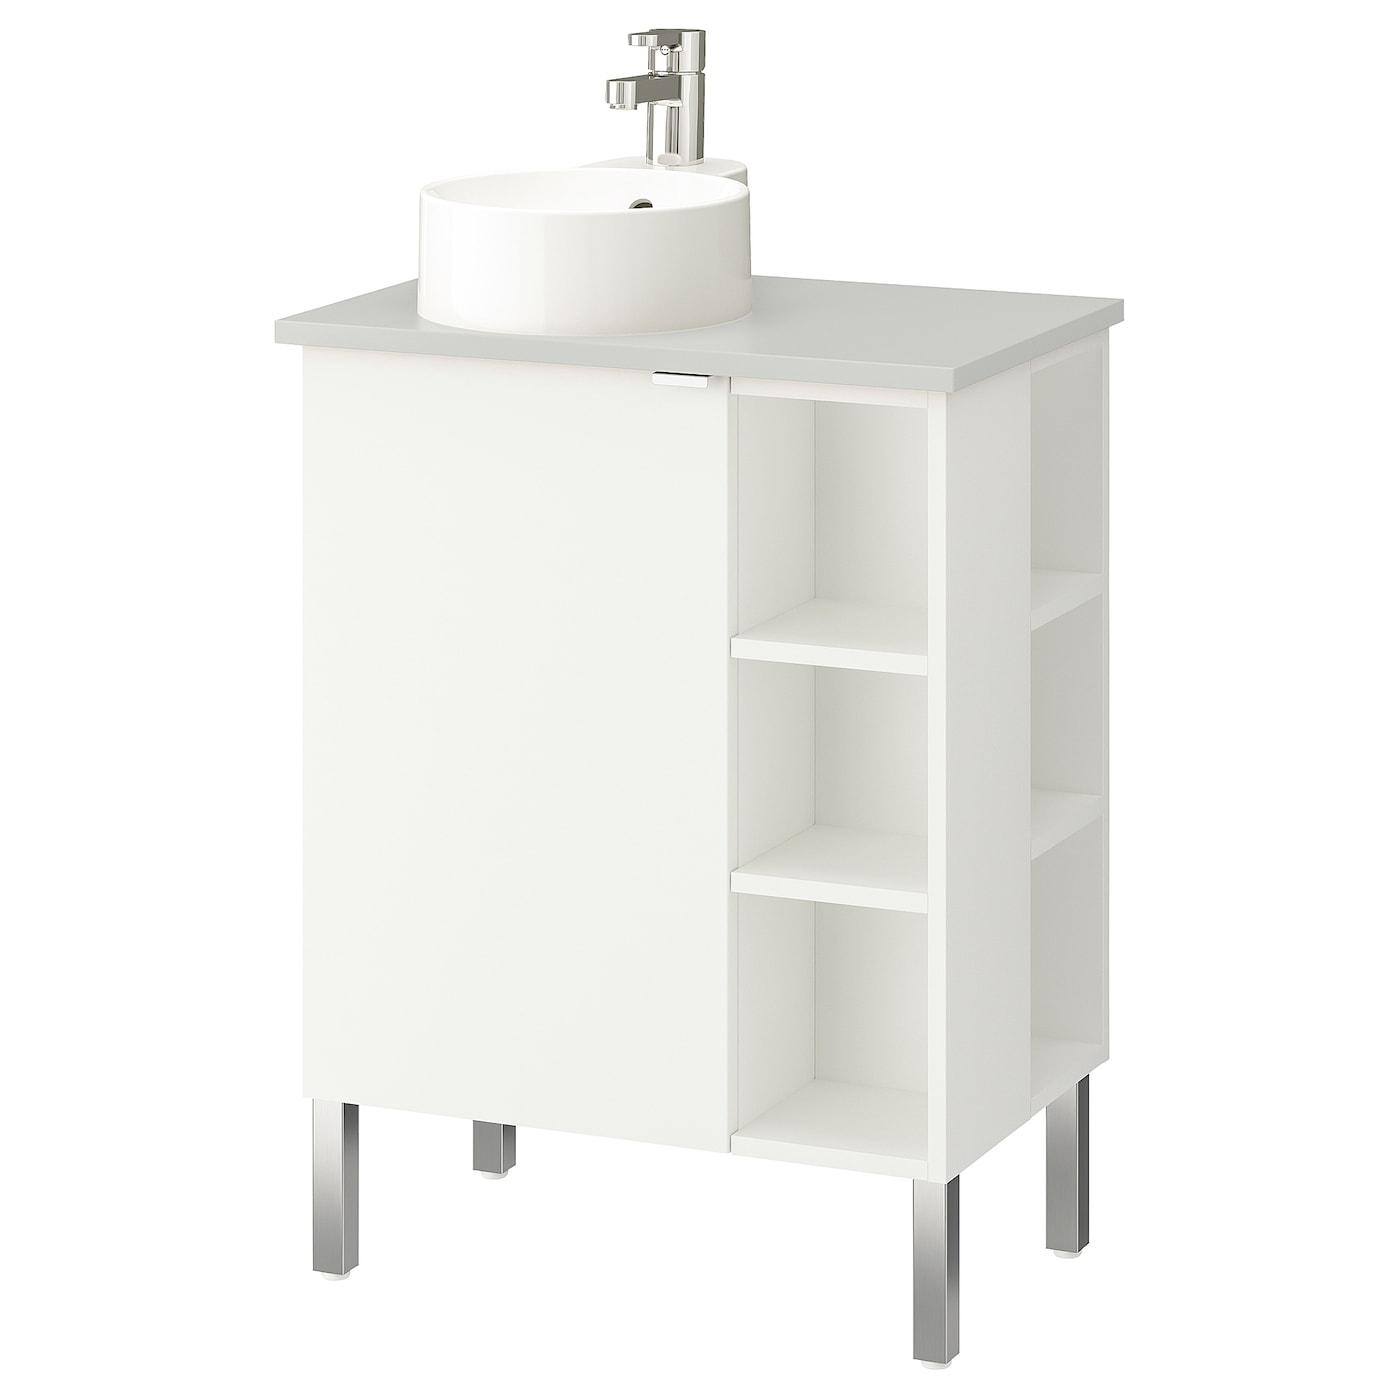 103.549.63 Gutviken Countertop Sink IKEA. White